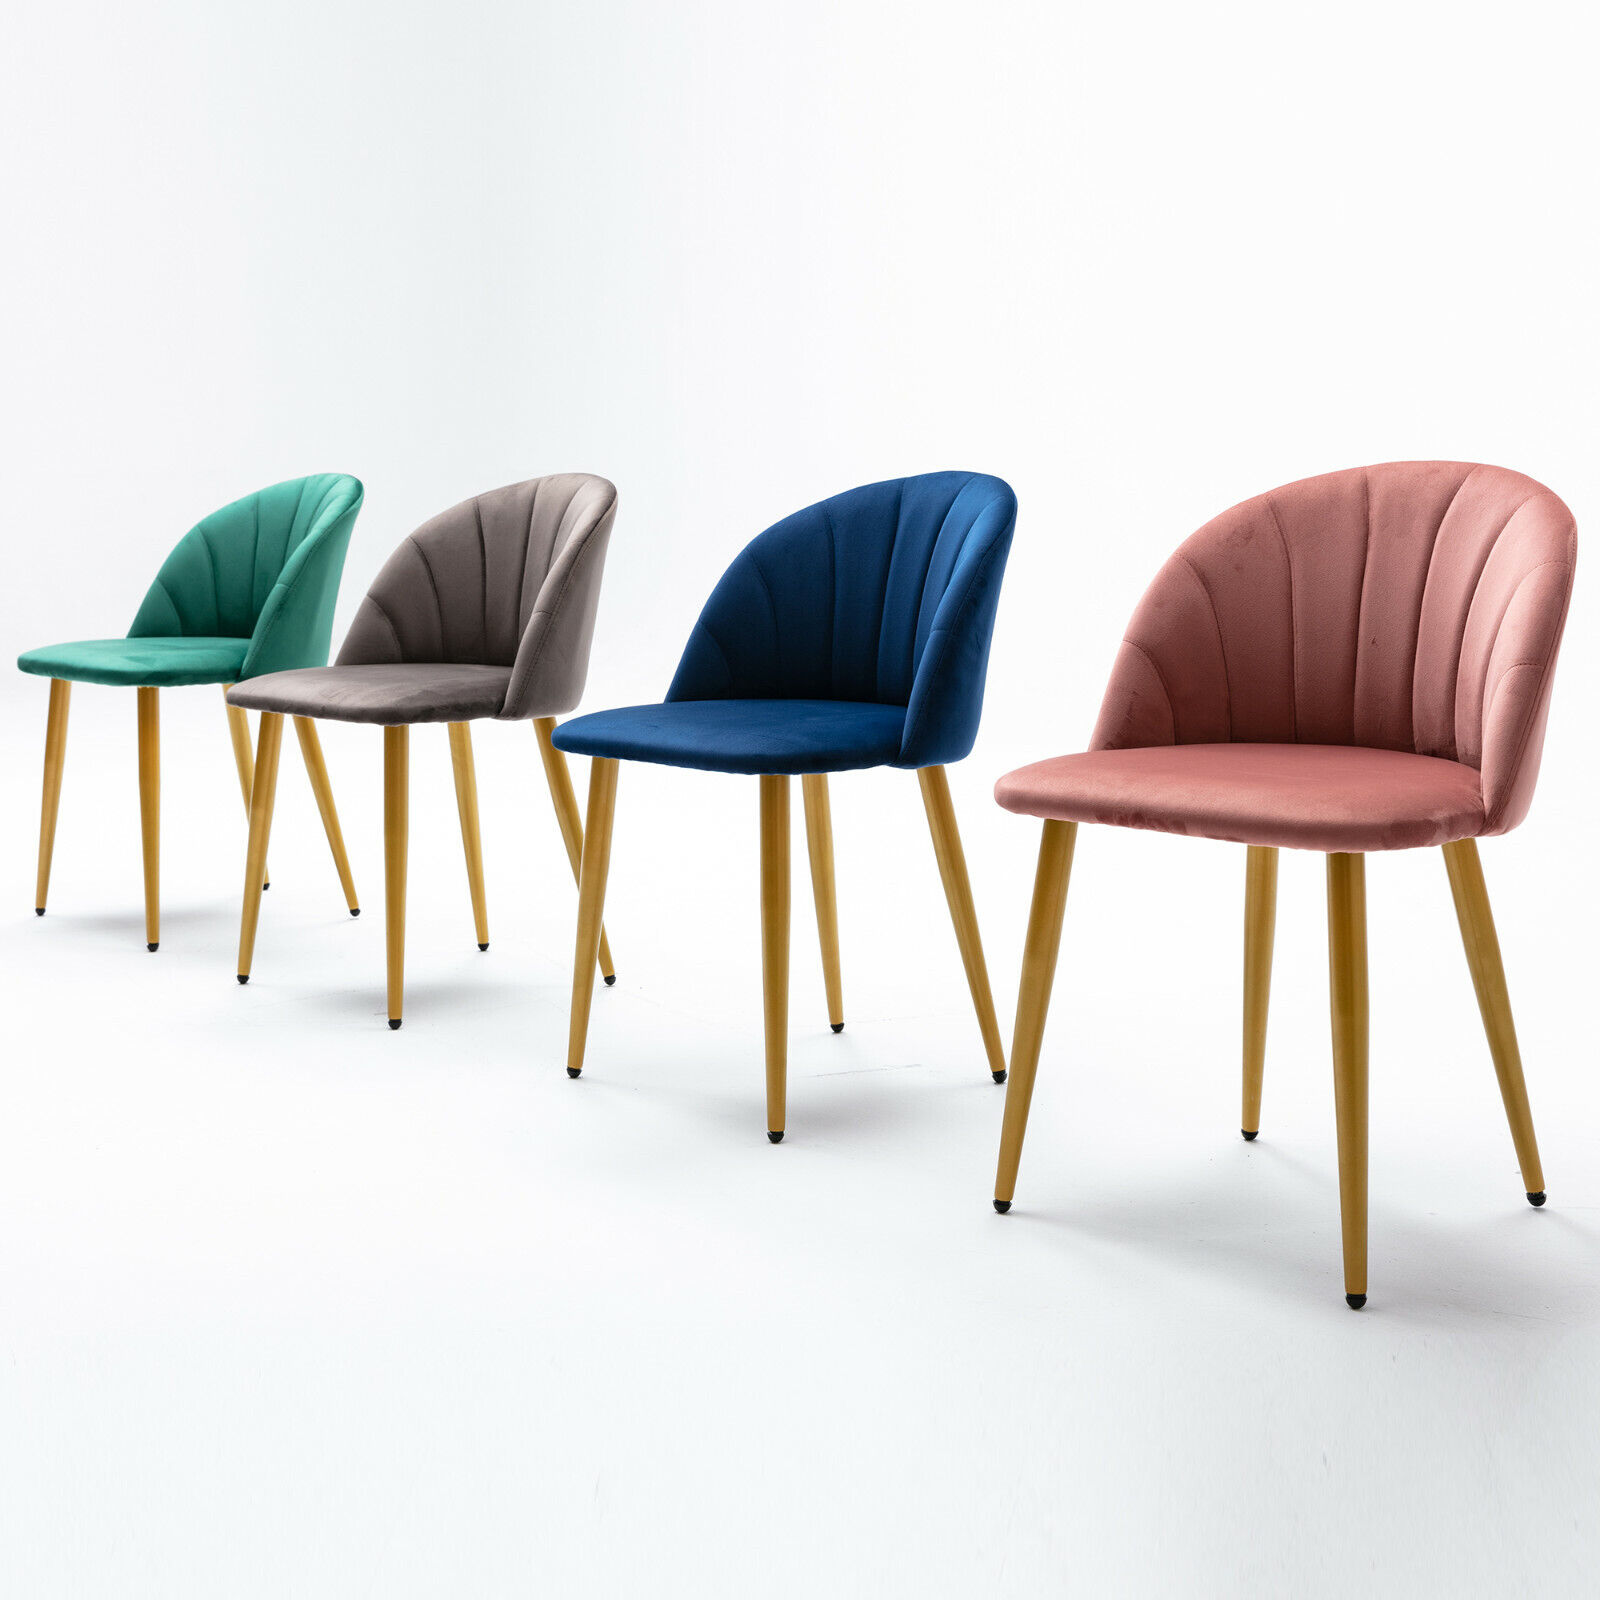 Set of 2 Velvet Dining Chair Modern Side Upholstered with Metal Legs Gren/Pink